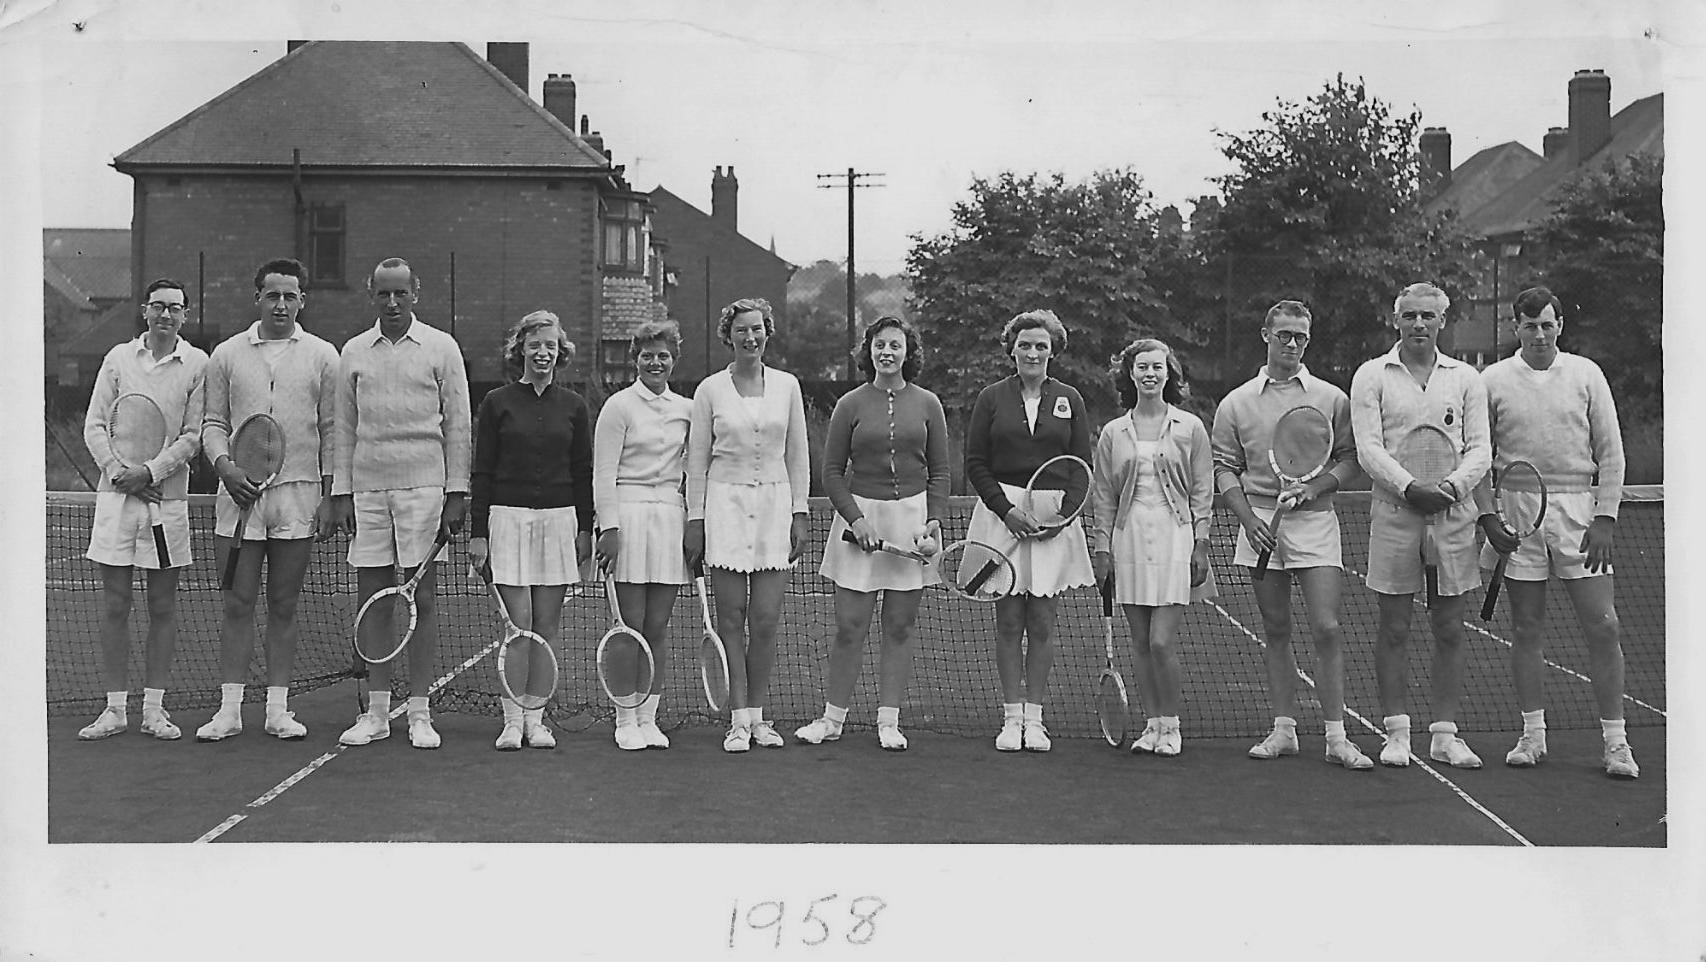 Plaayers 1958